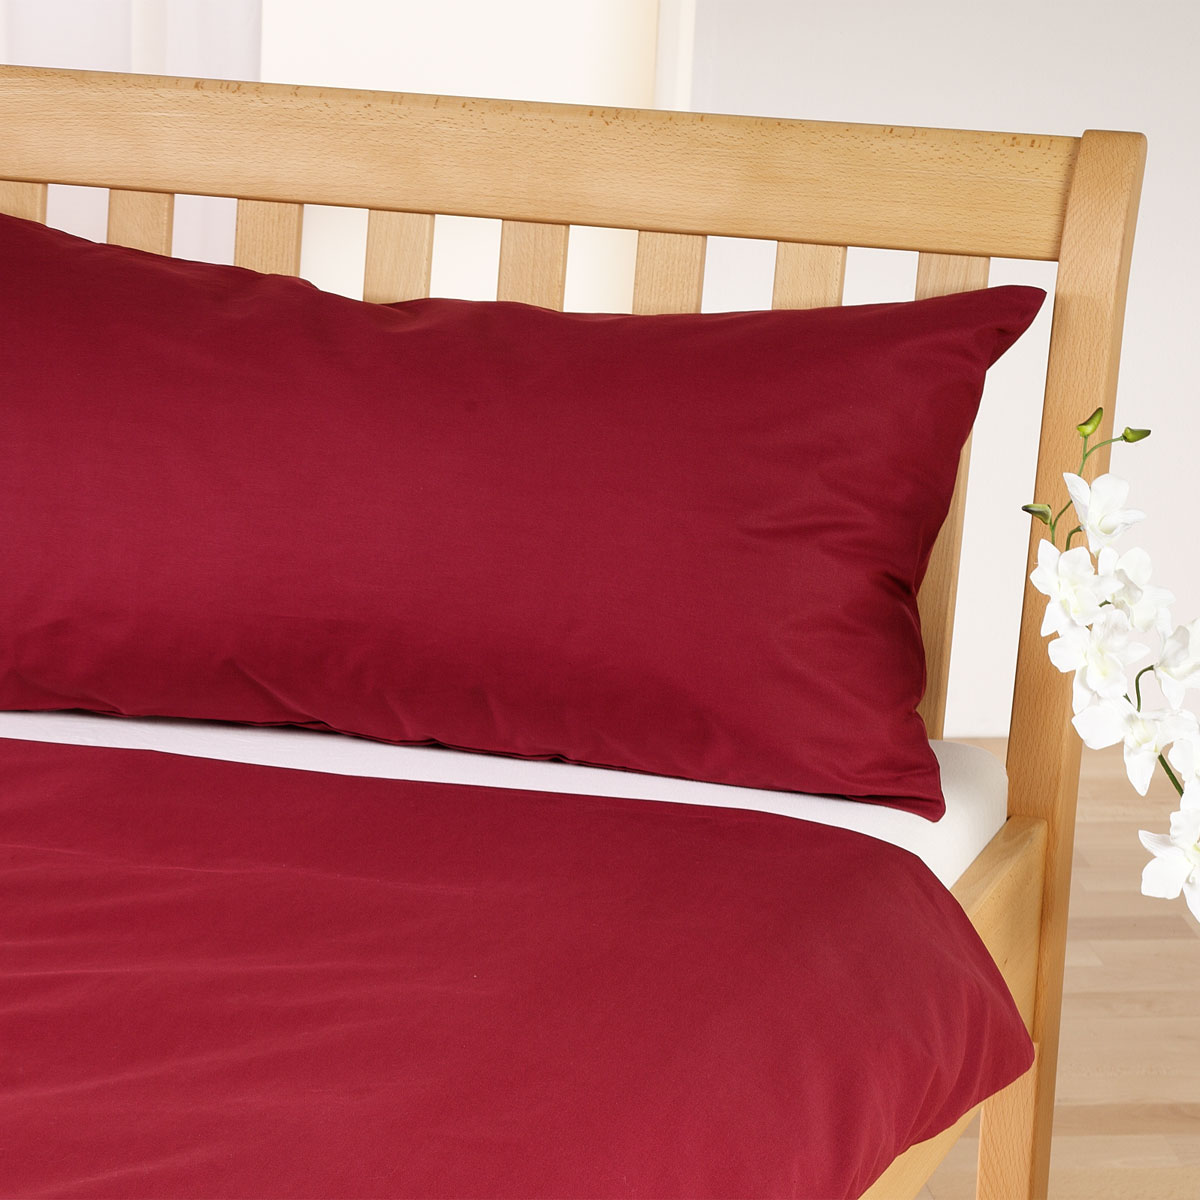 was bedeutet linon bettw sche my blog. Black Bedroom Furniture Sets. Home Design Ideas